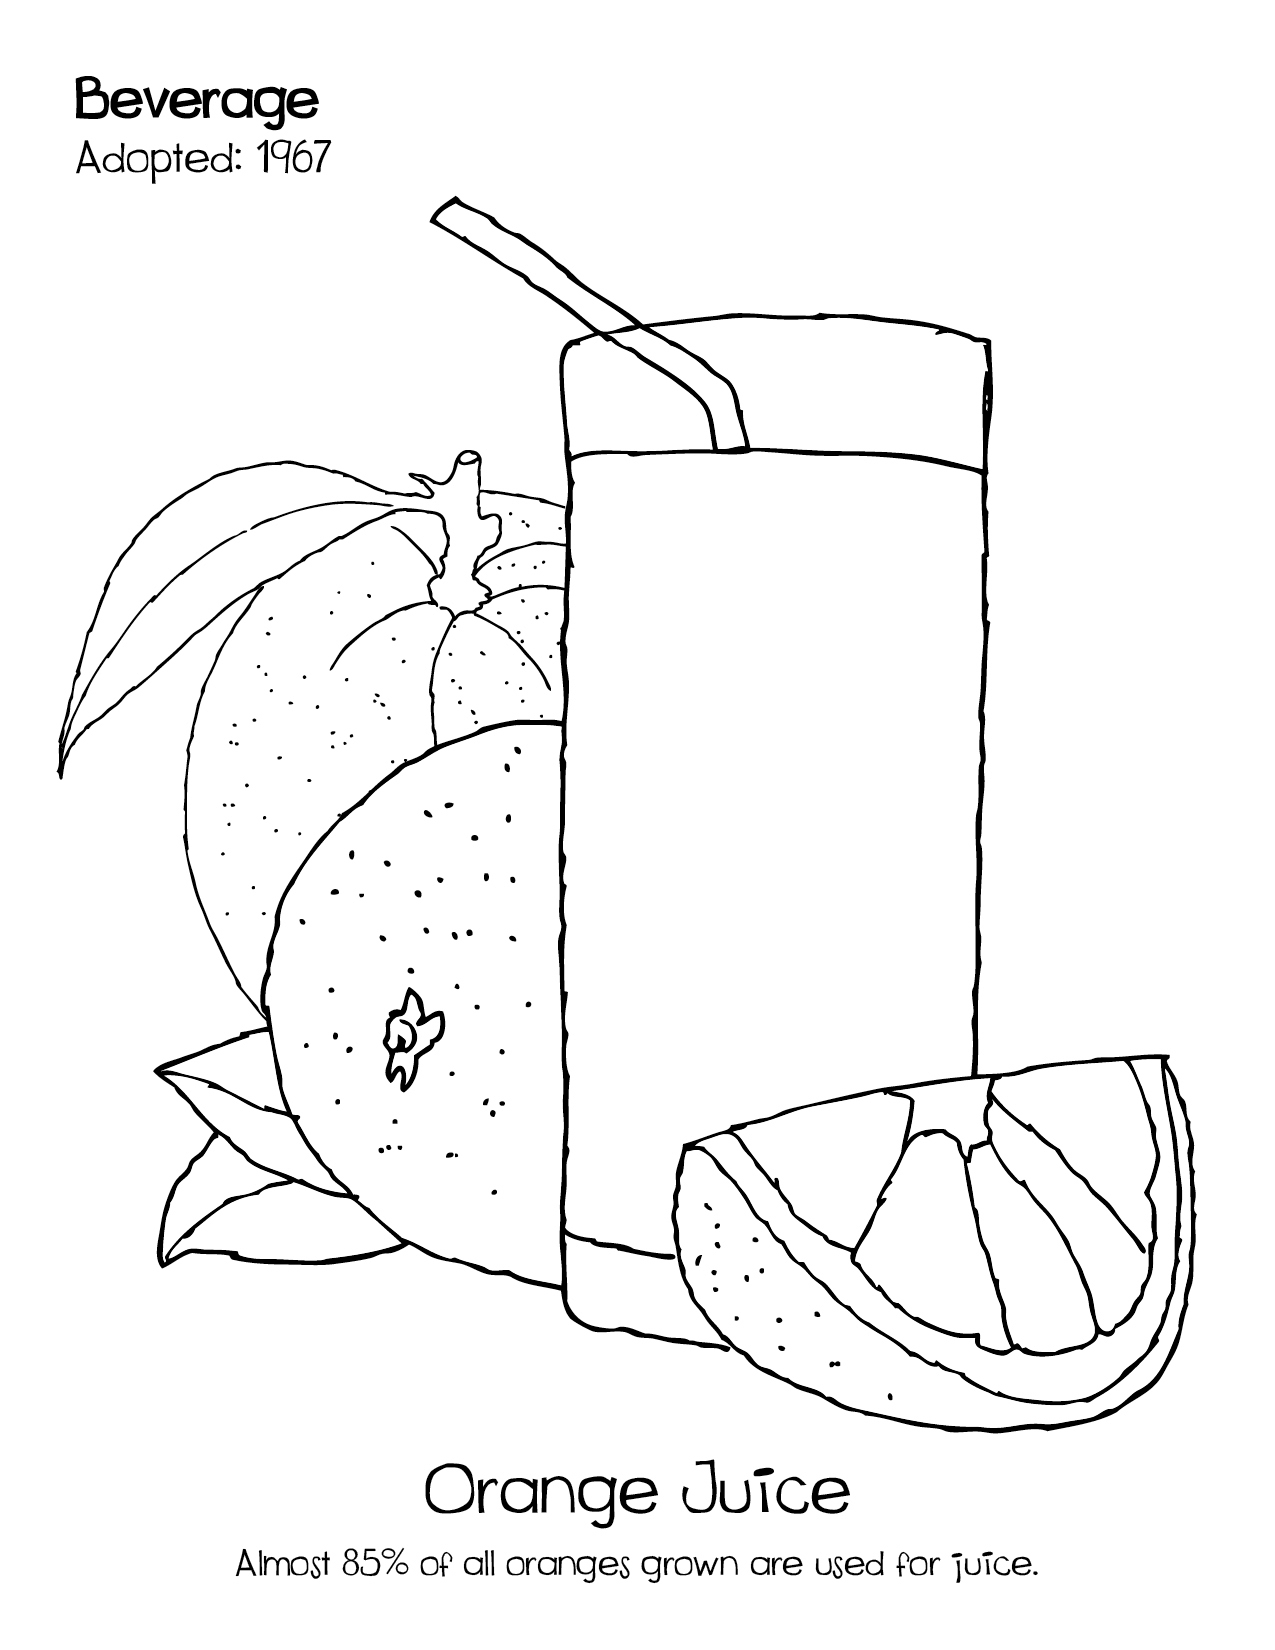 orange juice coloring pages - photo#14